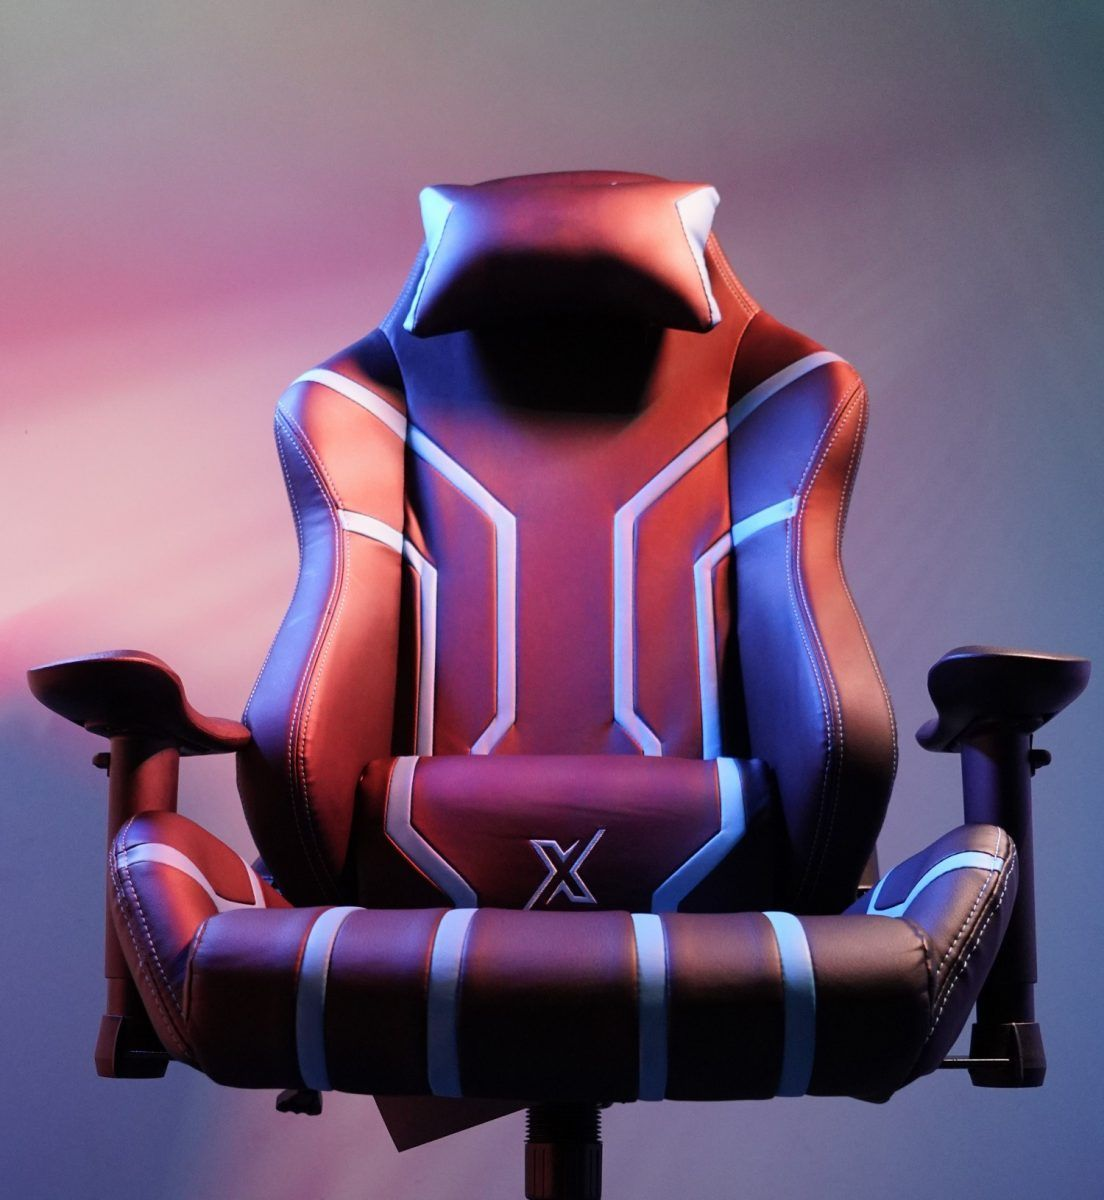 Geek Review Kane X Nemesis Gaming Chair Geekculture Geek